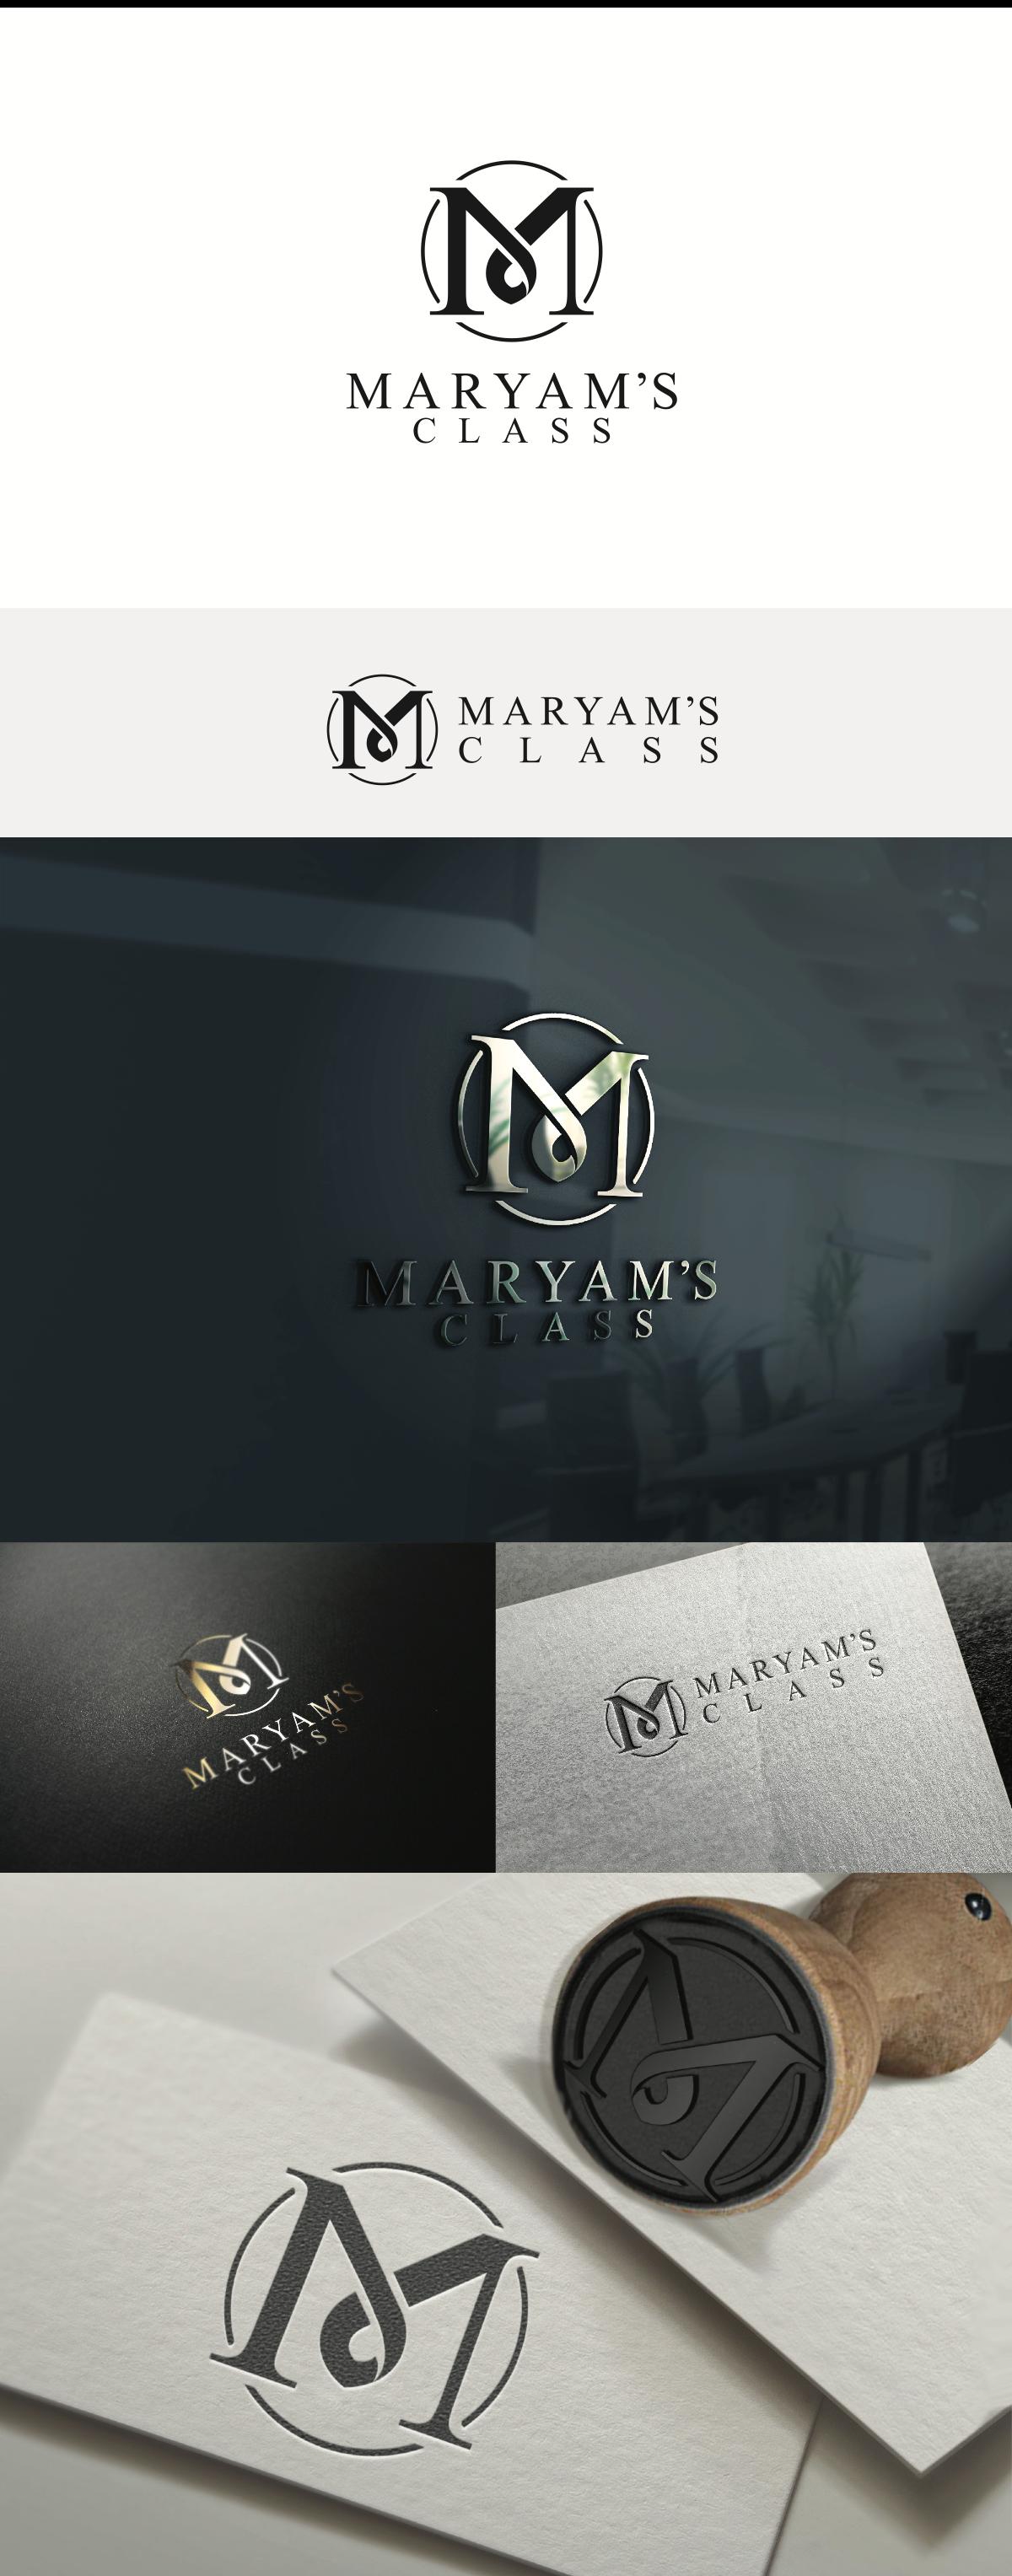 MARYAMS CLASS